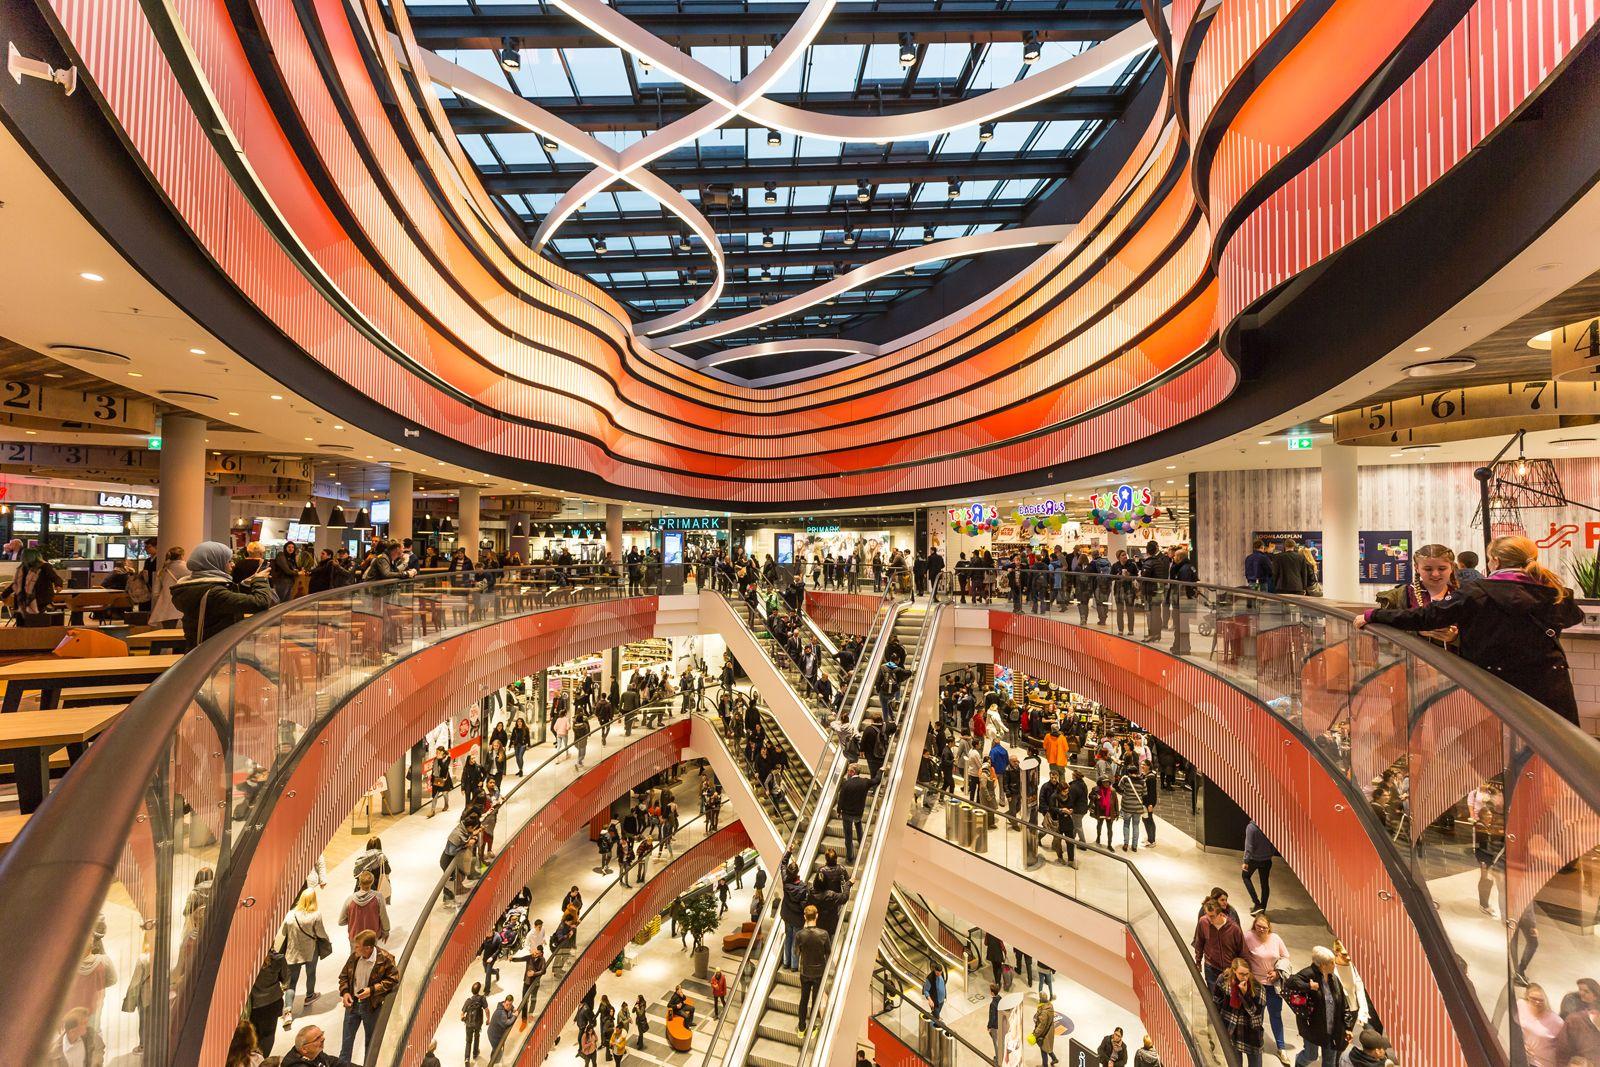 Image Result For Successful Thematic Mall Public Space Design Architecture Landscape Plans